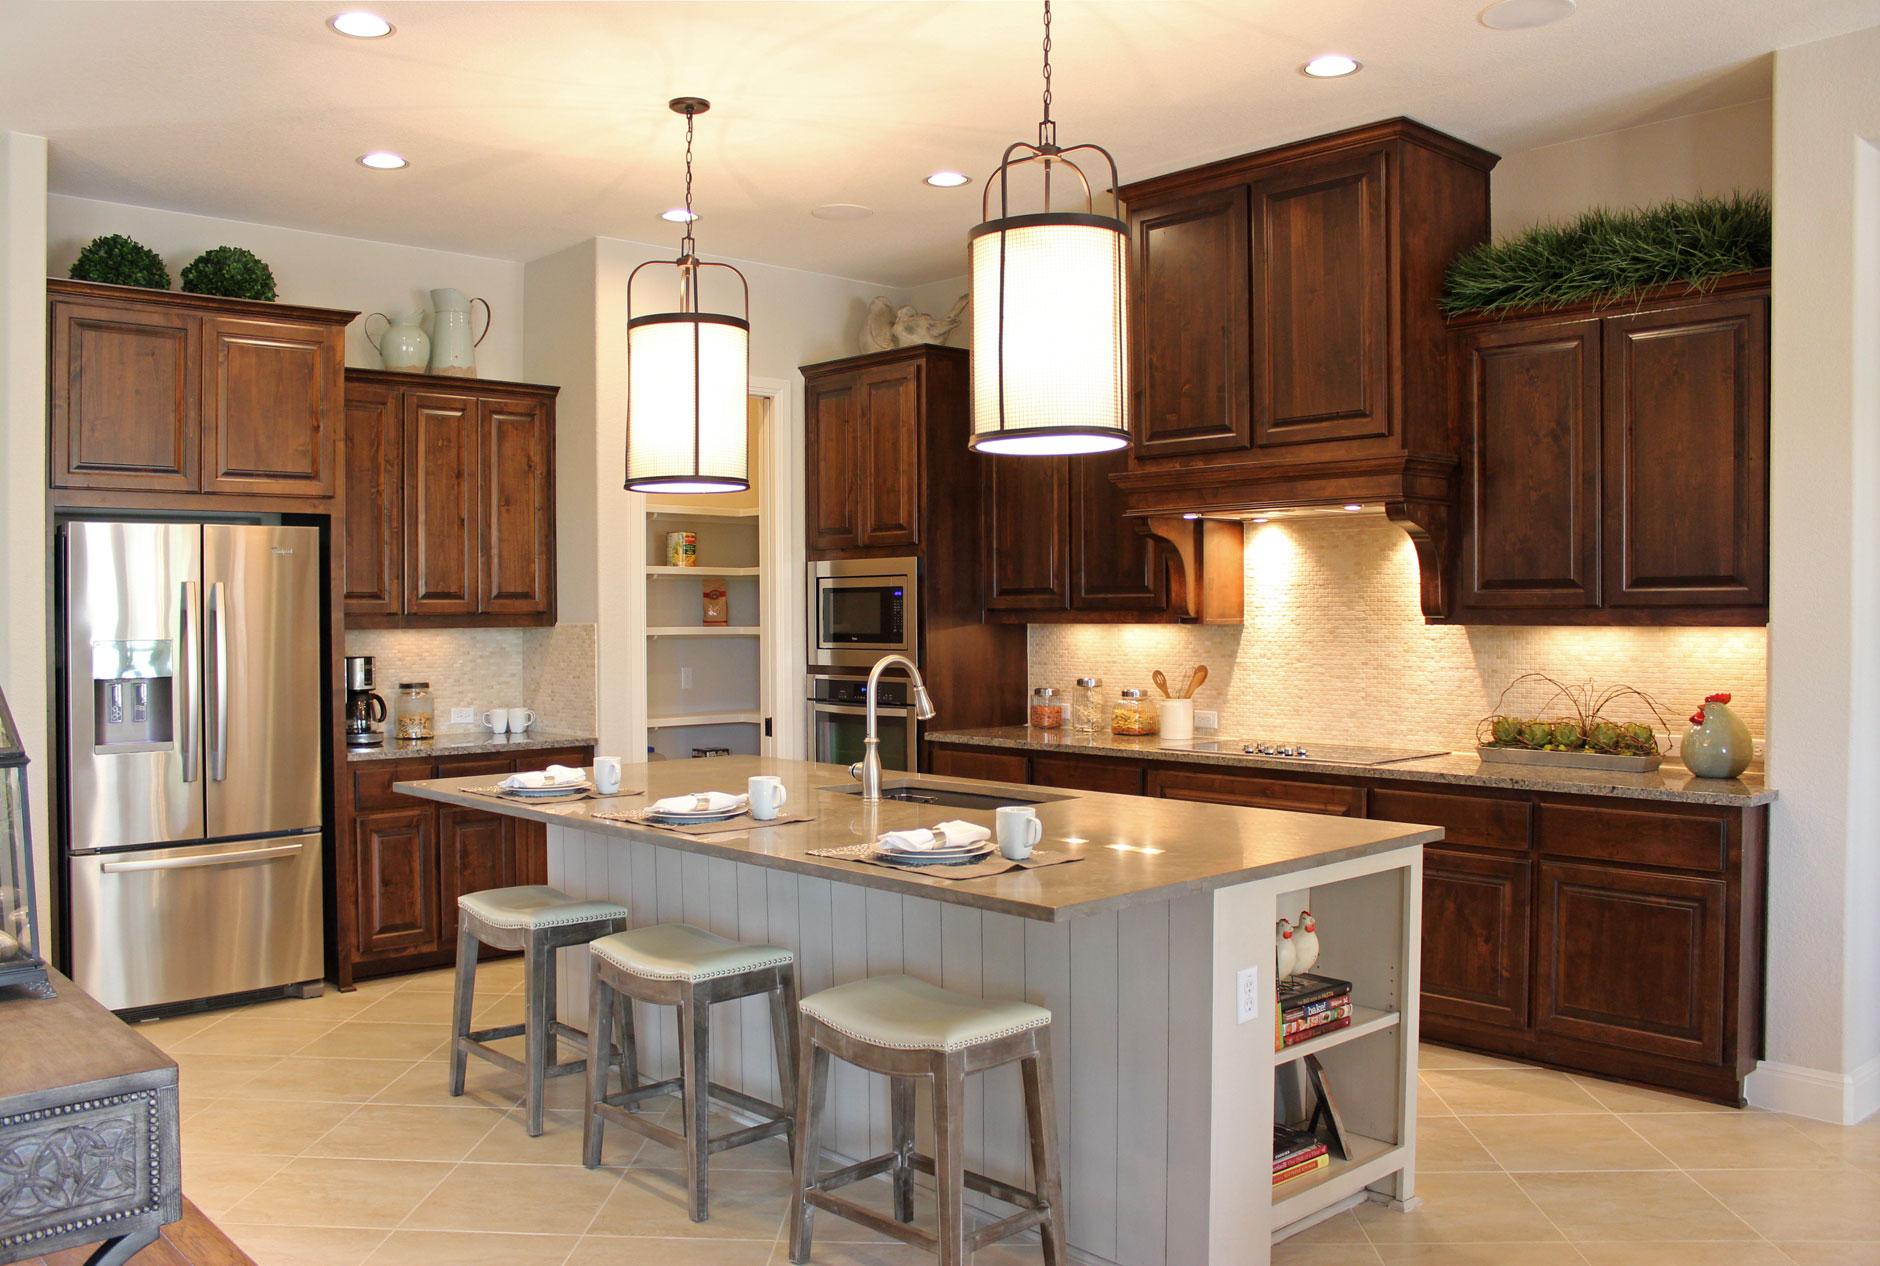 Burrows Cabinets Kitchen In Knotty Alder W Custom Vent Hood